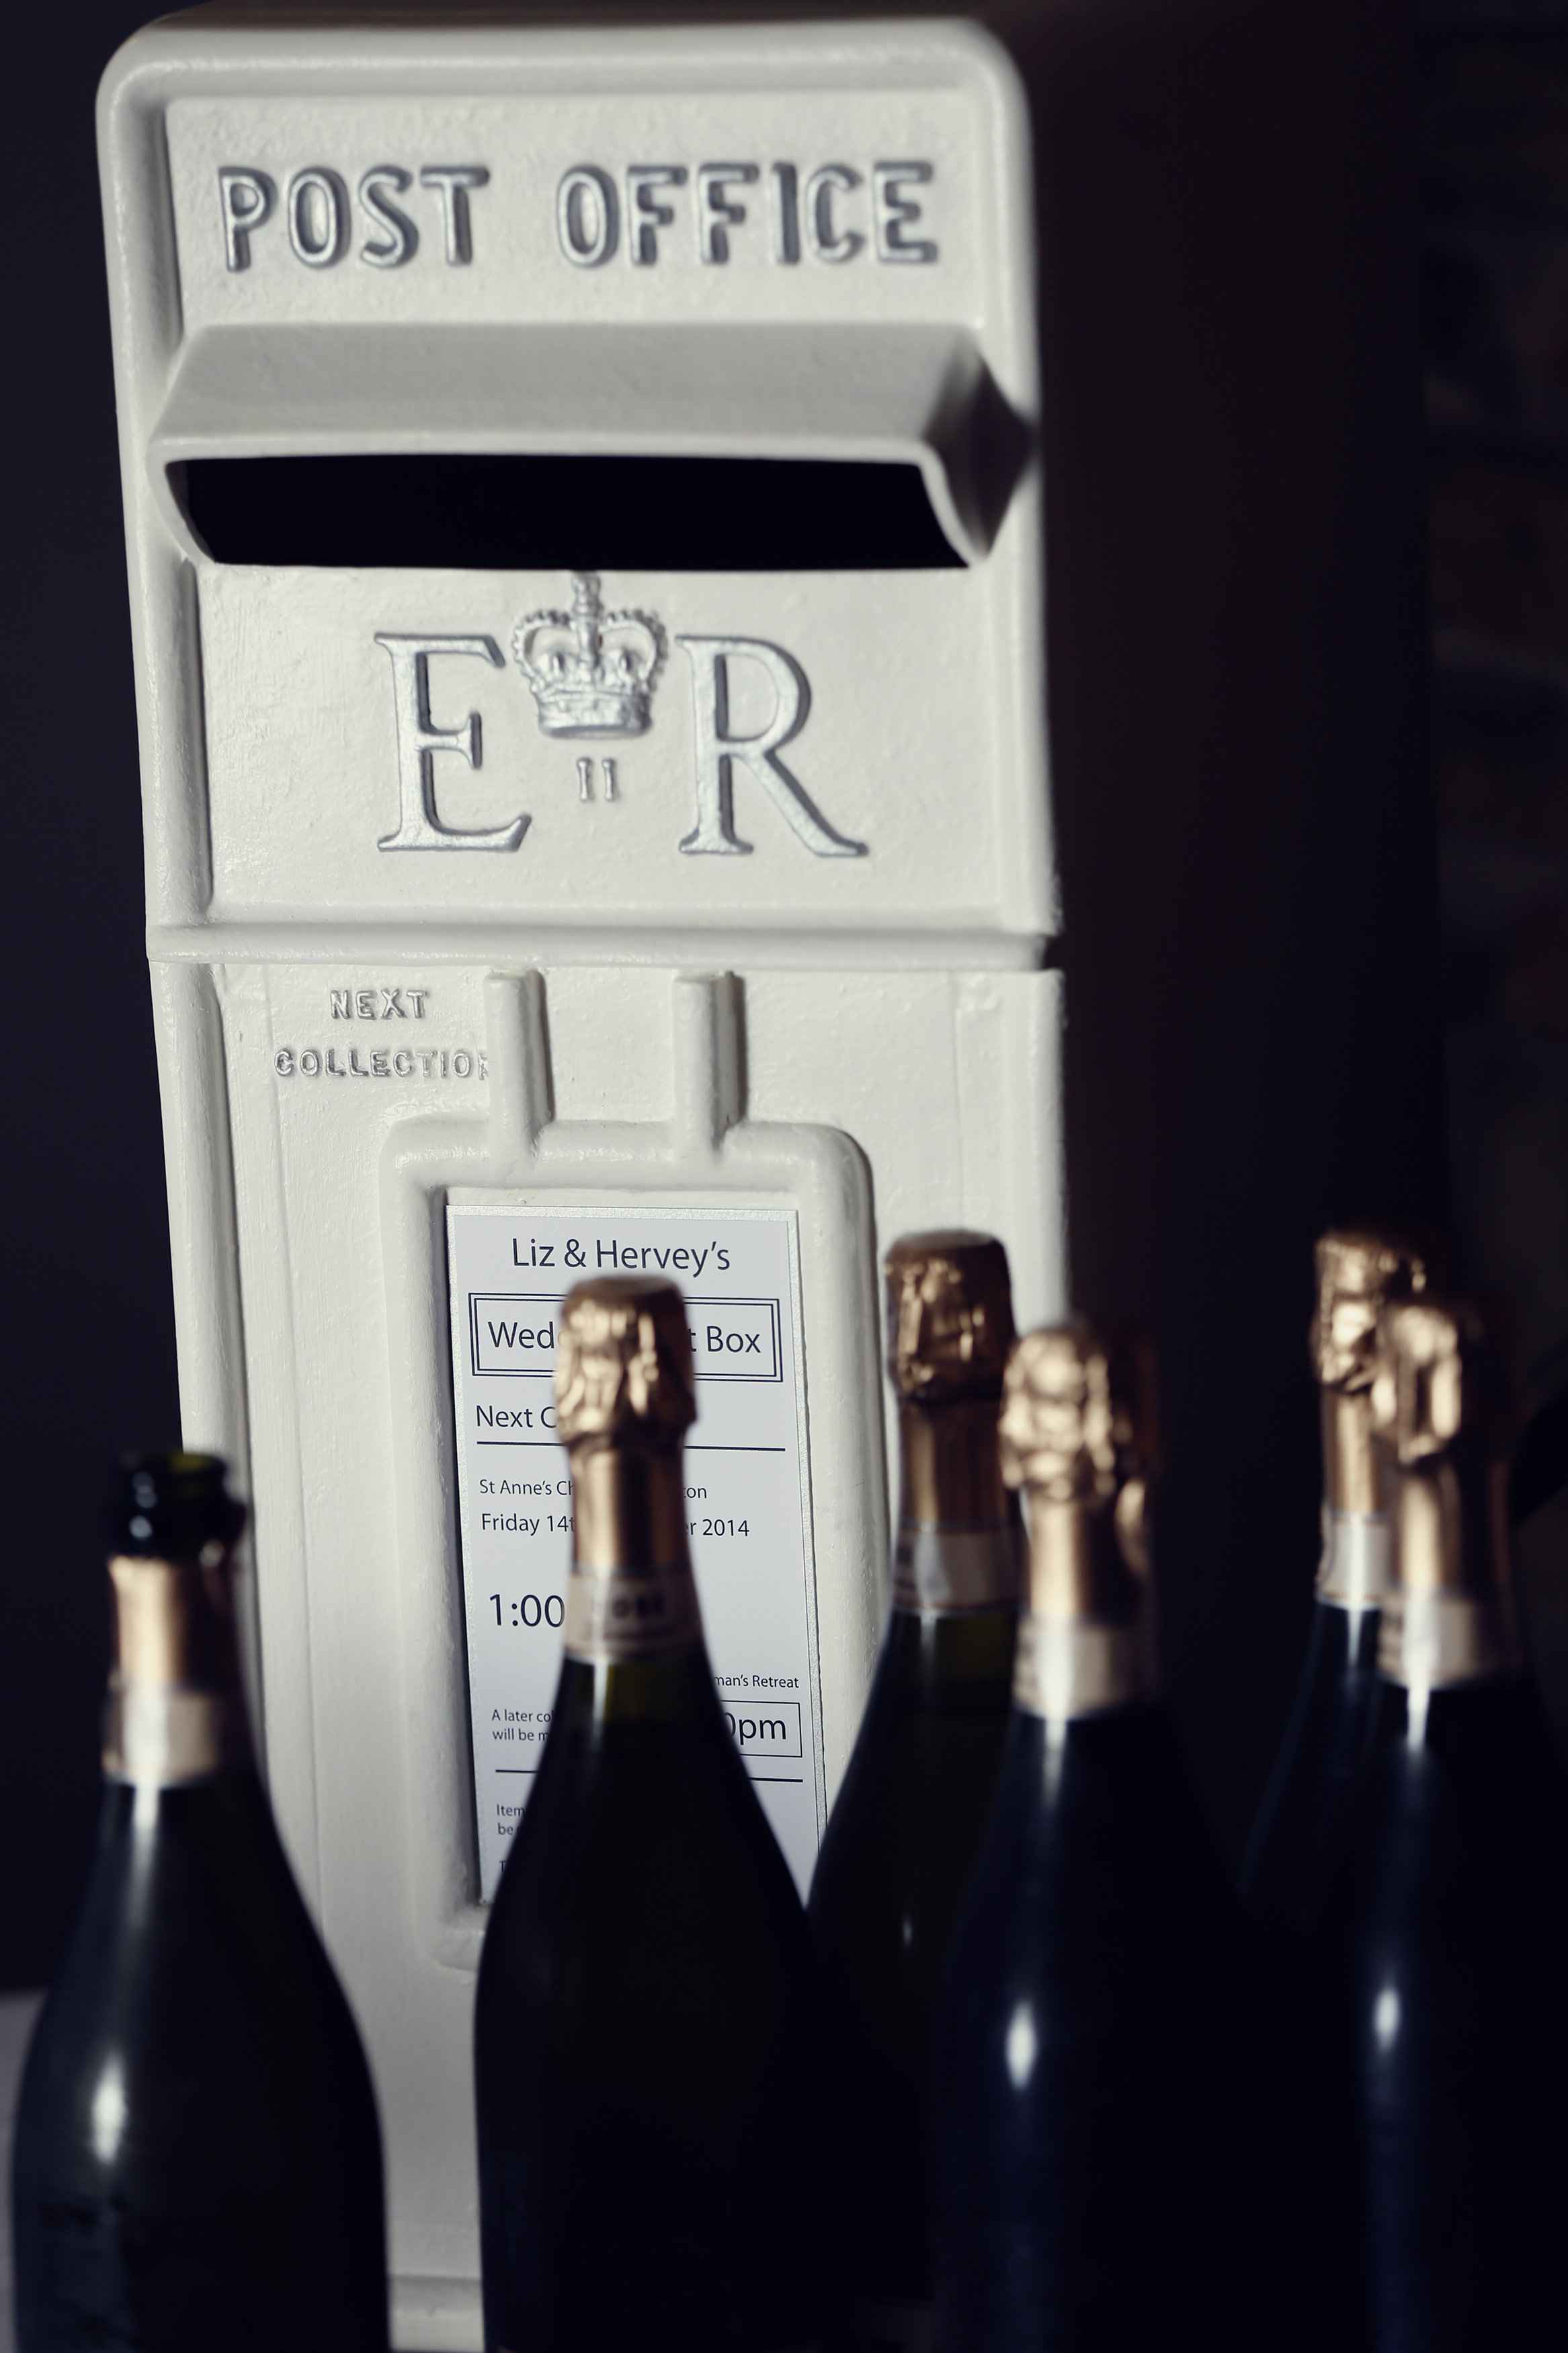 Royal Mail 'ER' Post Box